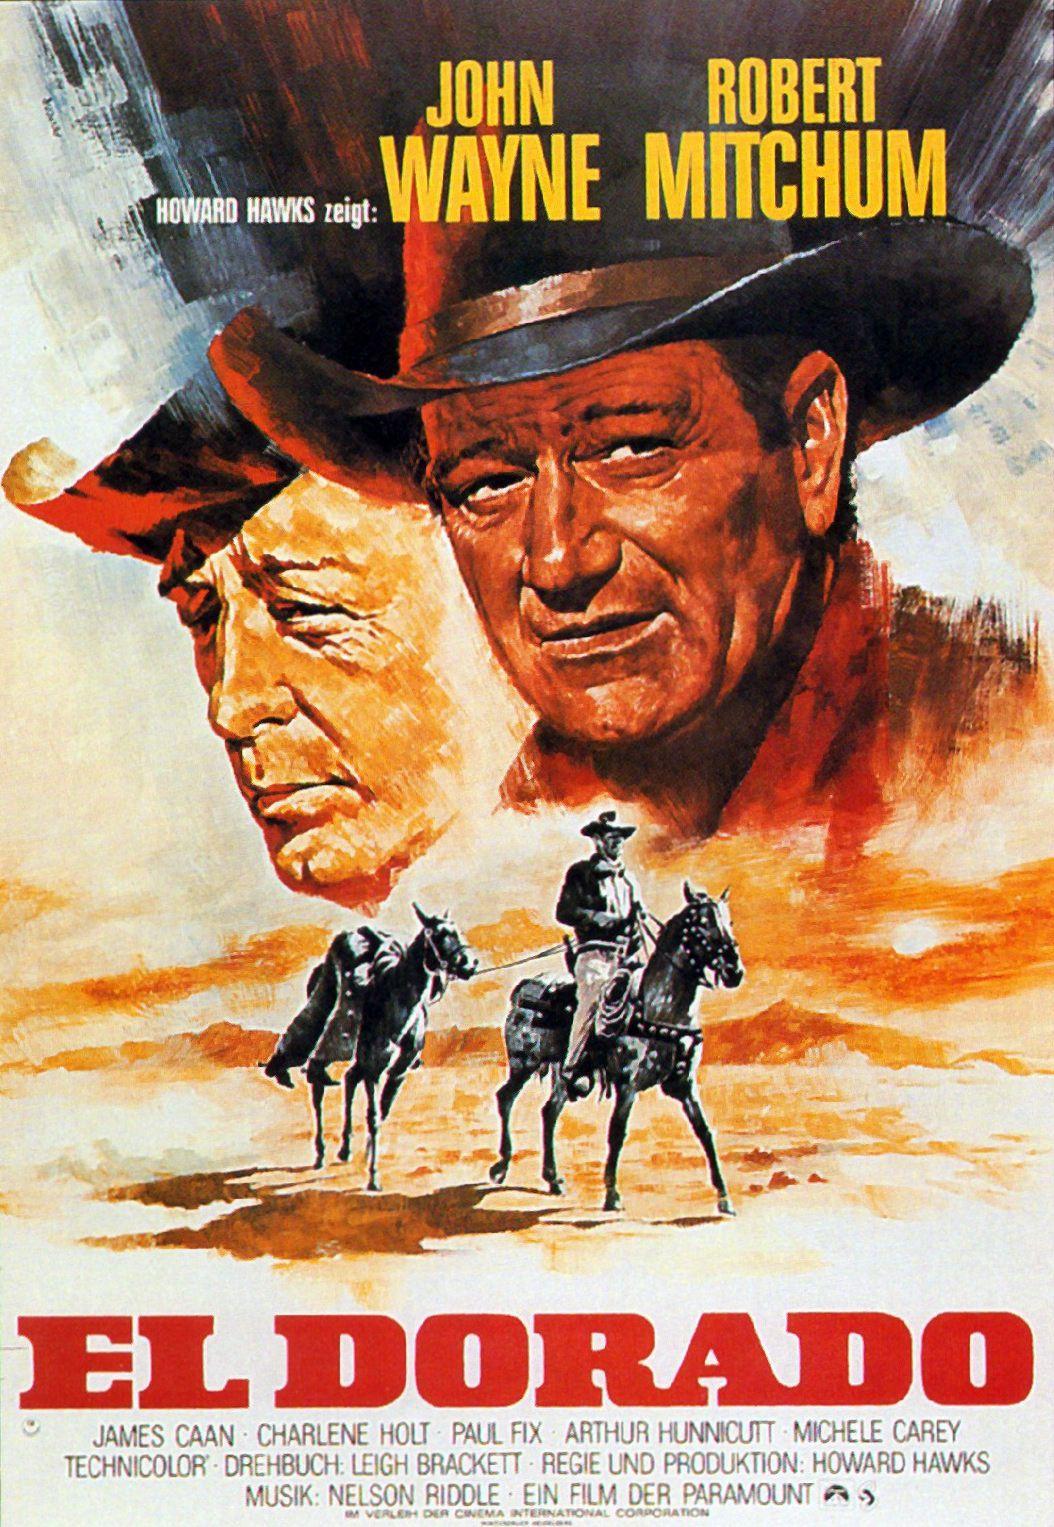 "John Wayne Quote Life Is Hard El Dorado"" 1966Western Starring John Wayne Robert Mitchum Ed"